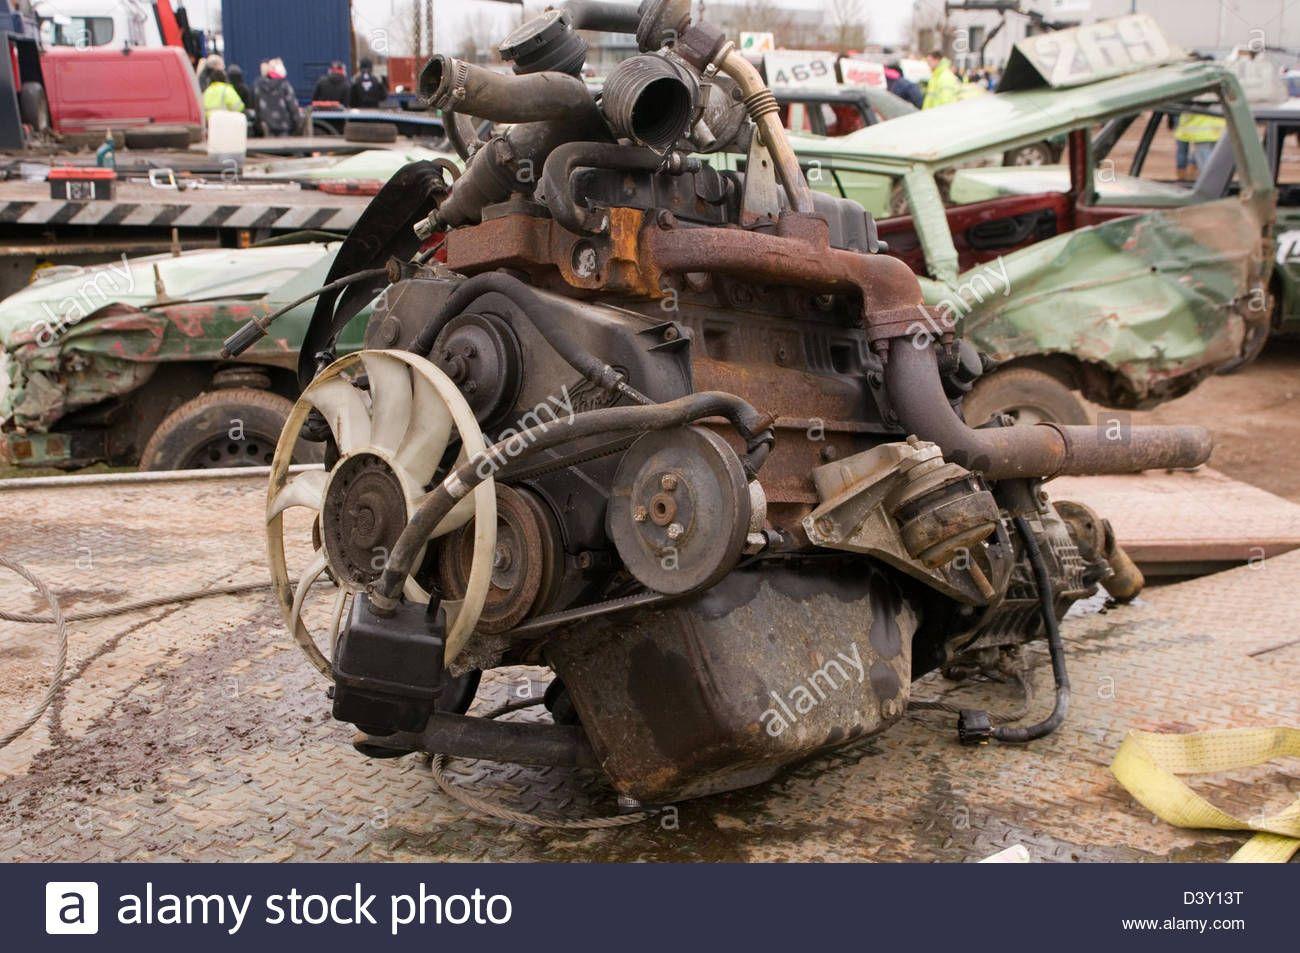 Scrap Engine Car Cars Engines Metal Old Junk Scrapyard Scrapyards Car Engine Car Car Scrap